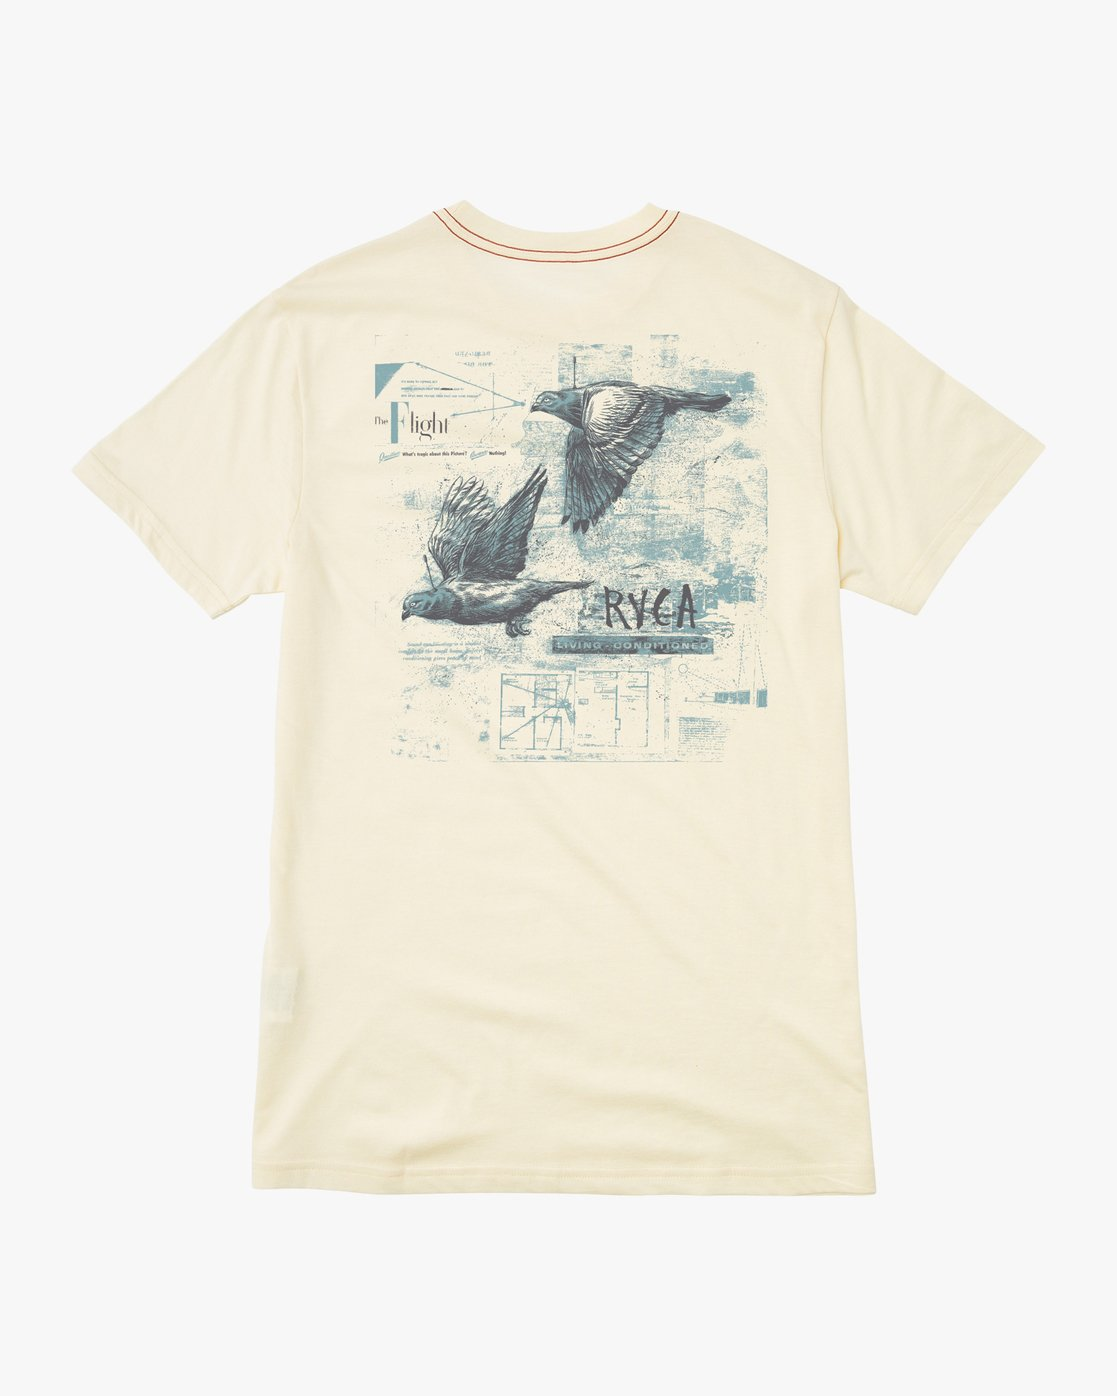 0 Living Conditions Ben Horton T-Shirt Yellow M420PRLI RVCA